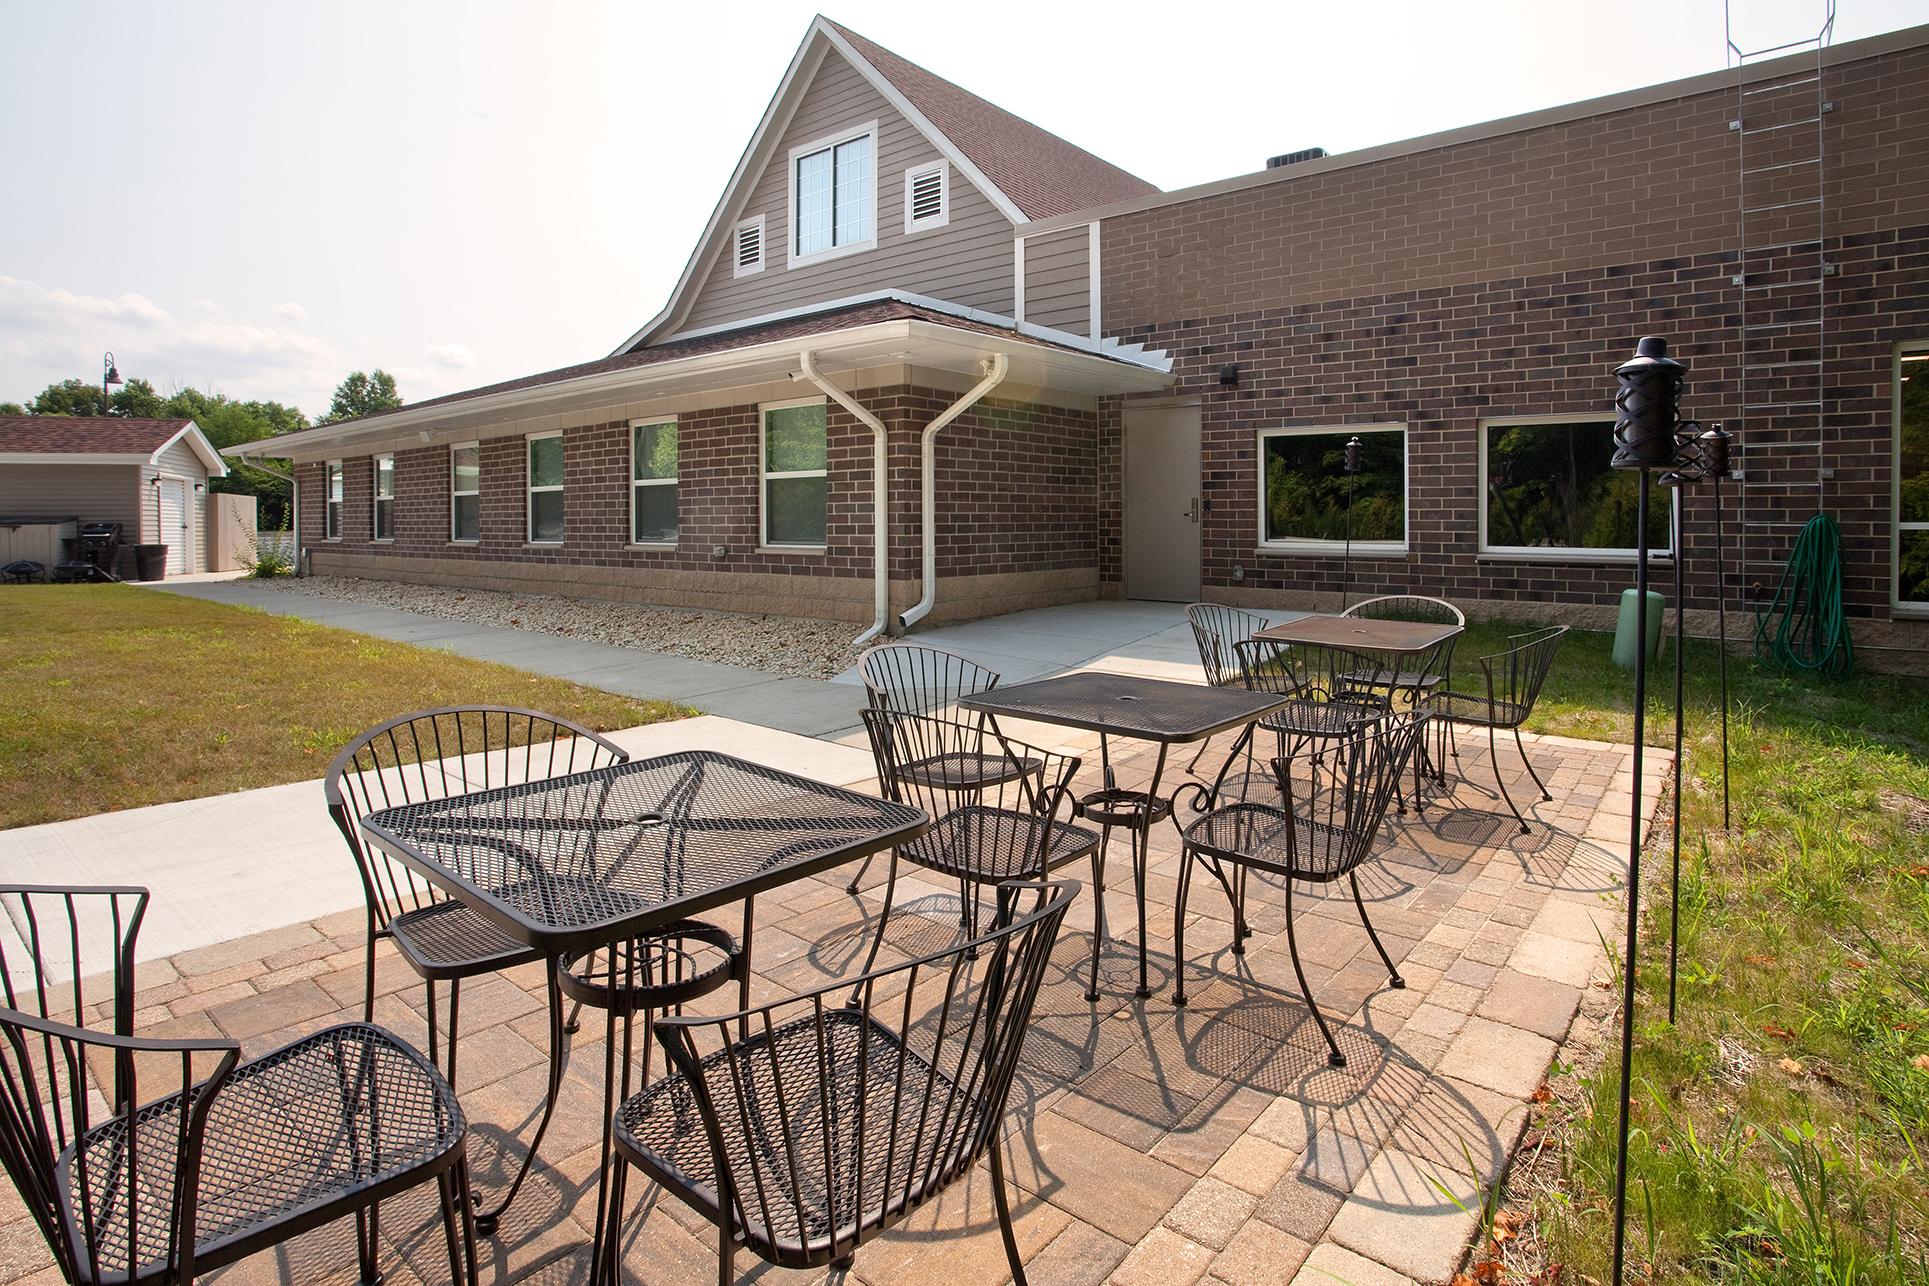 hickory-creek-church-side-patio